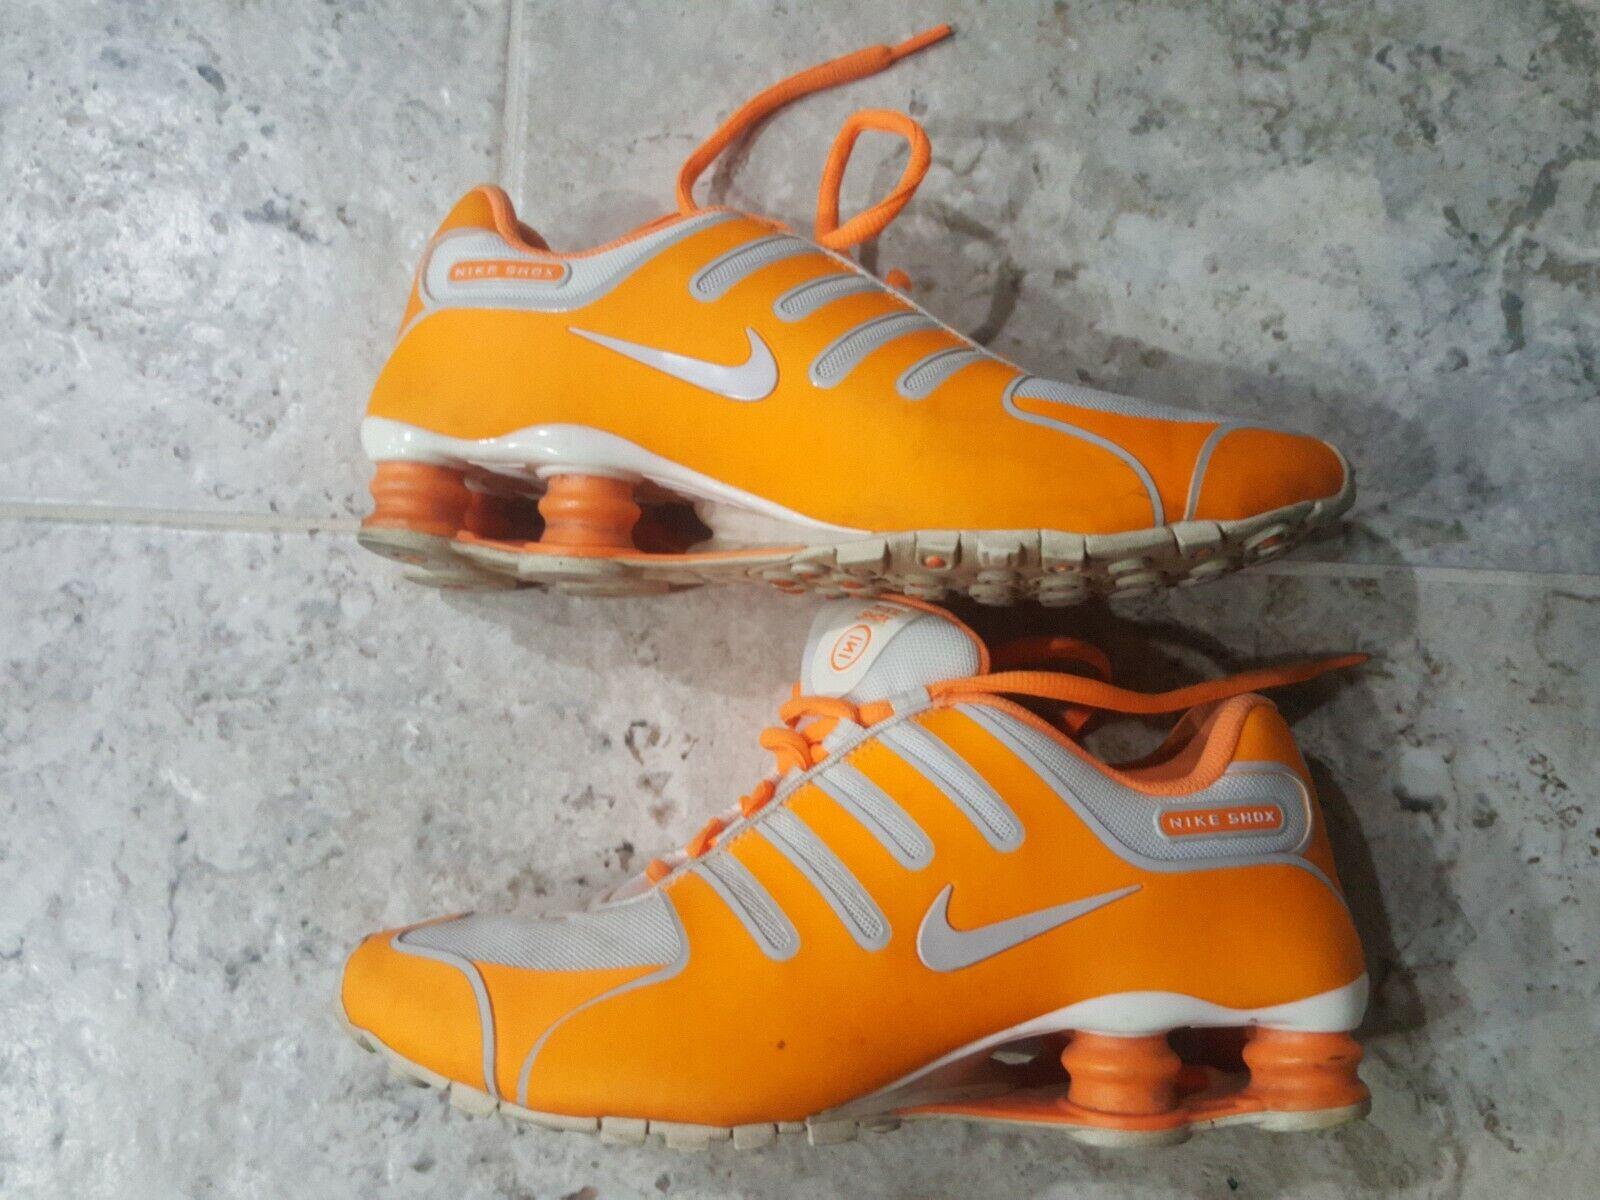 NIKE WOMEN'S SHOX NZ HYPER NEON orange 580574-800 SZ US8.5 UK6 EXTREMELY RARE